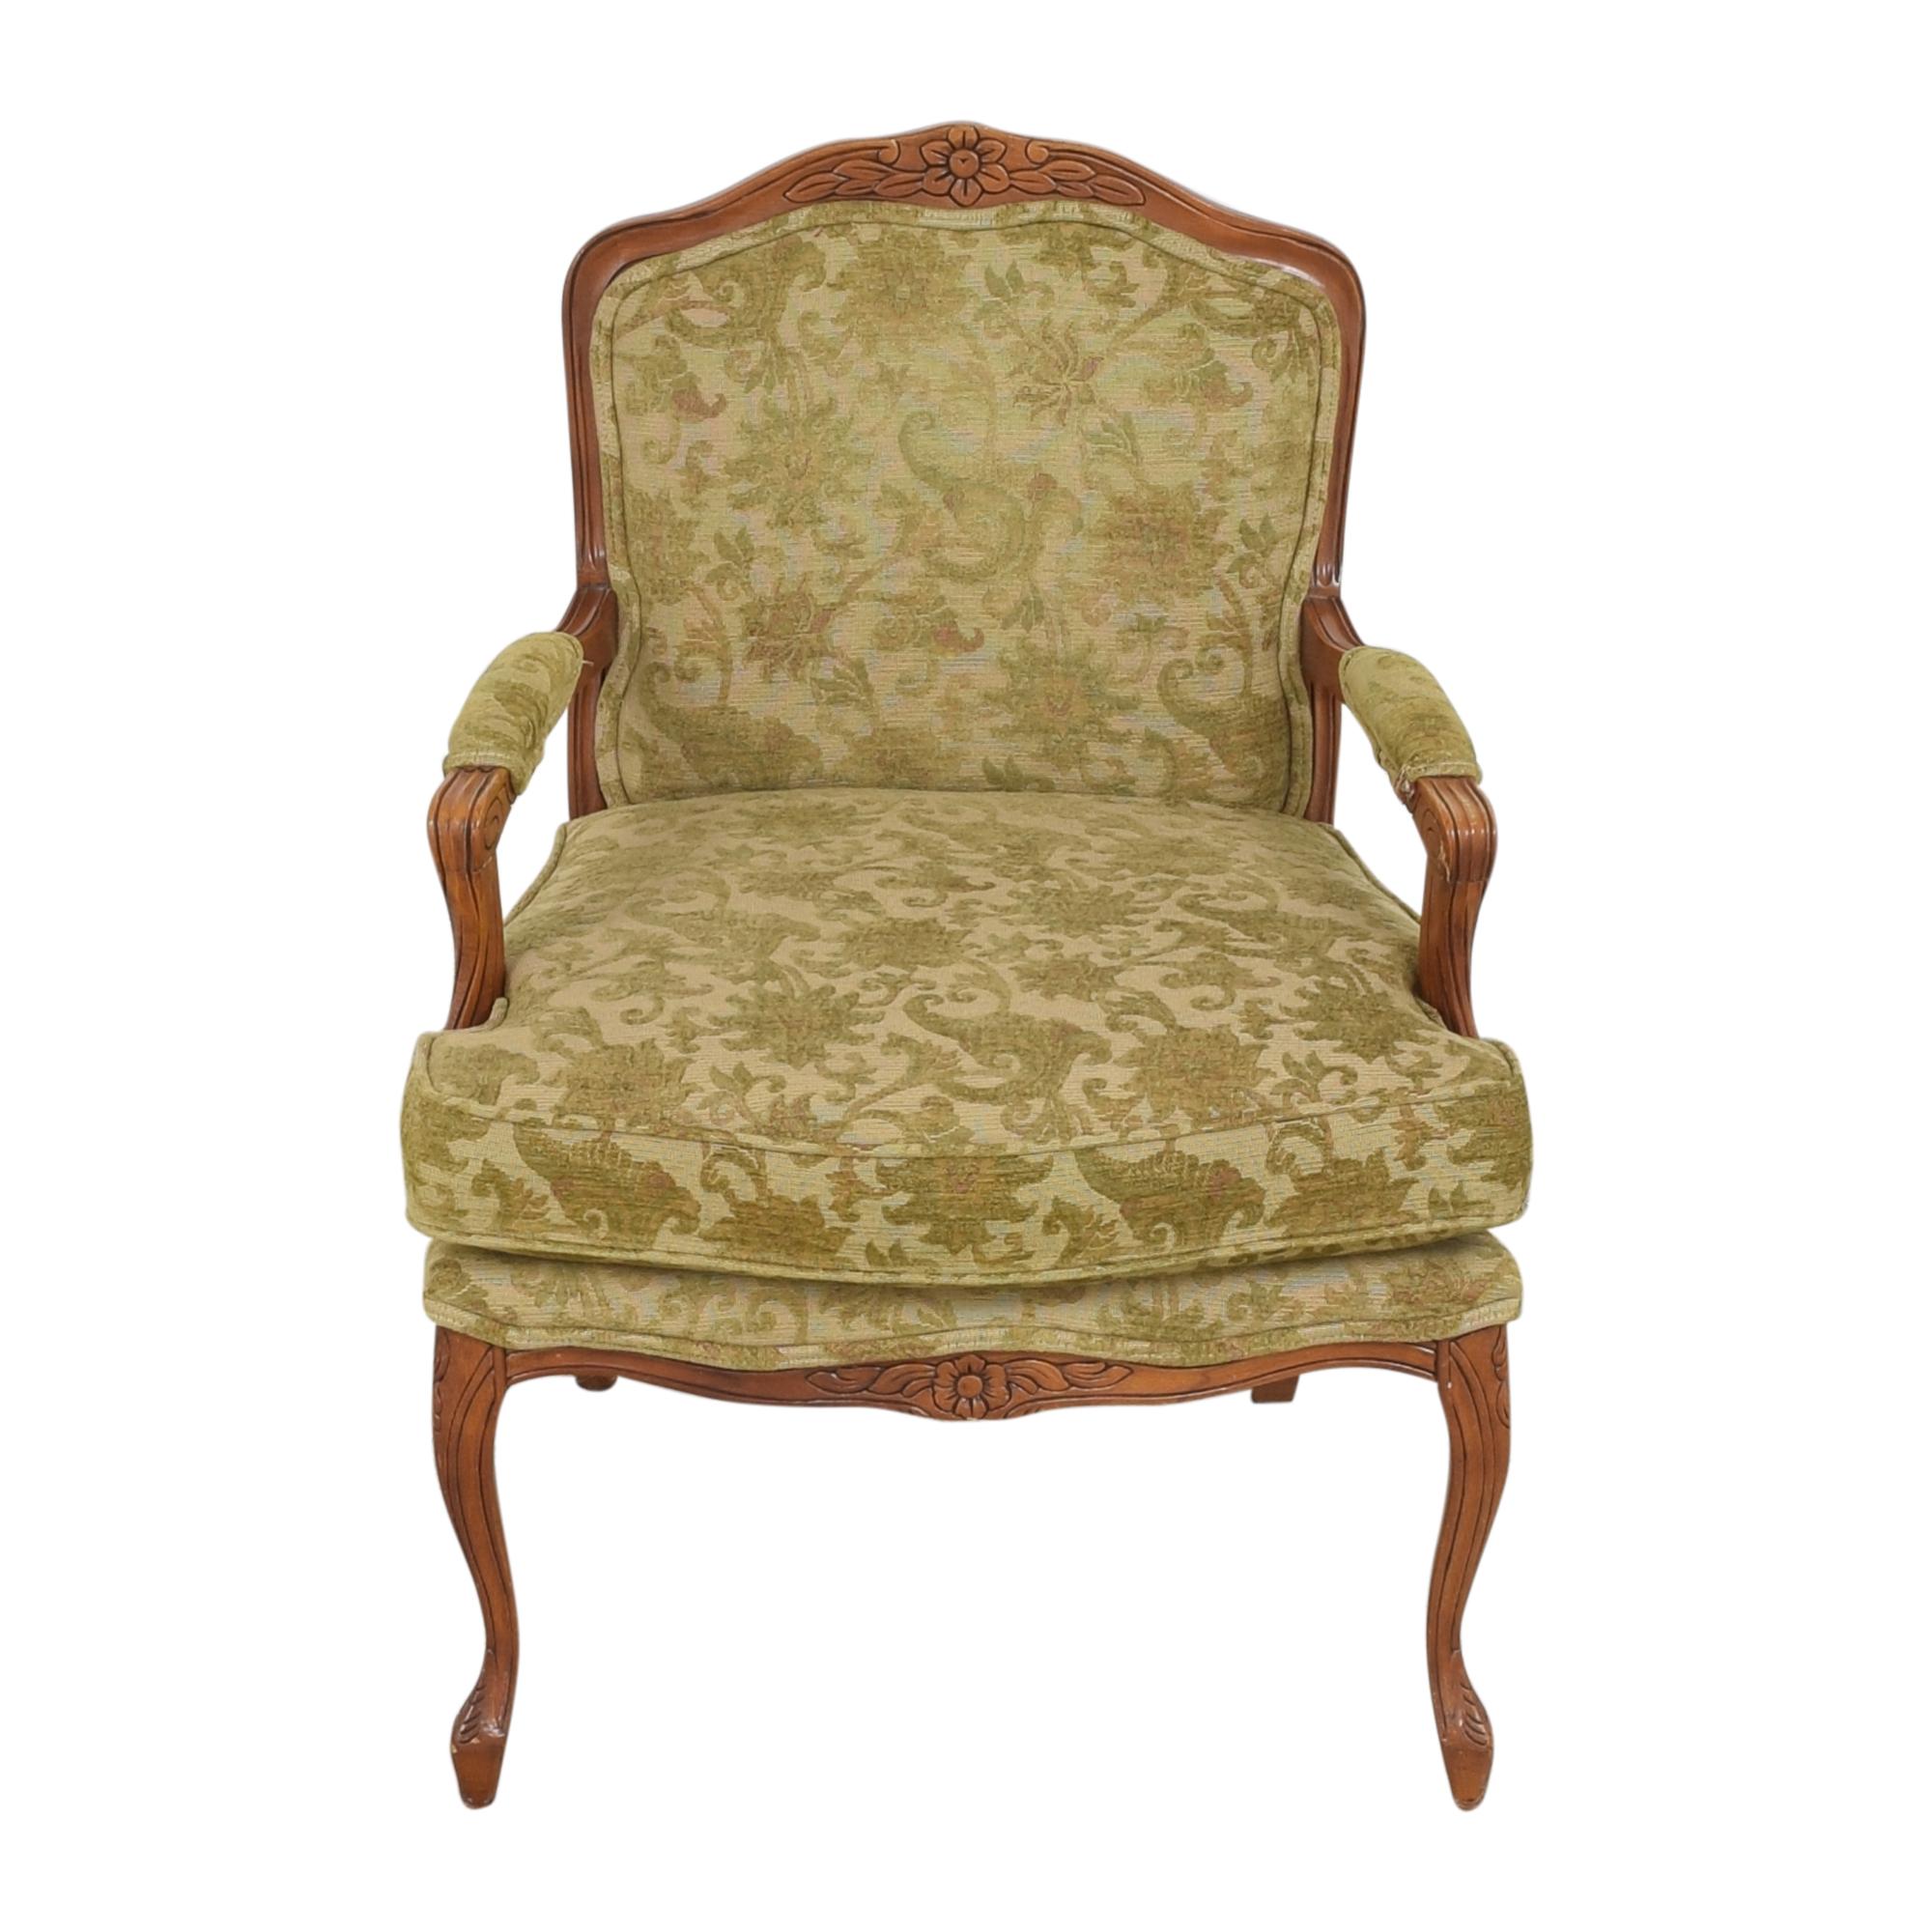 Century Furniture Fauteuil Accent Chair sale